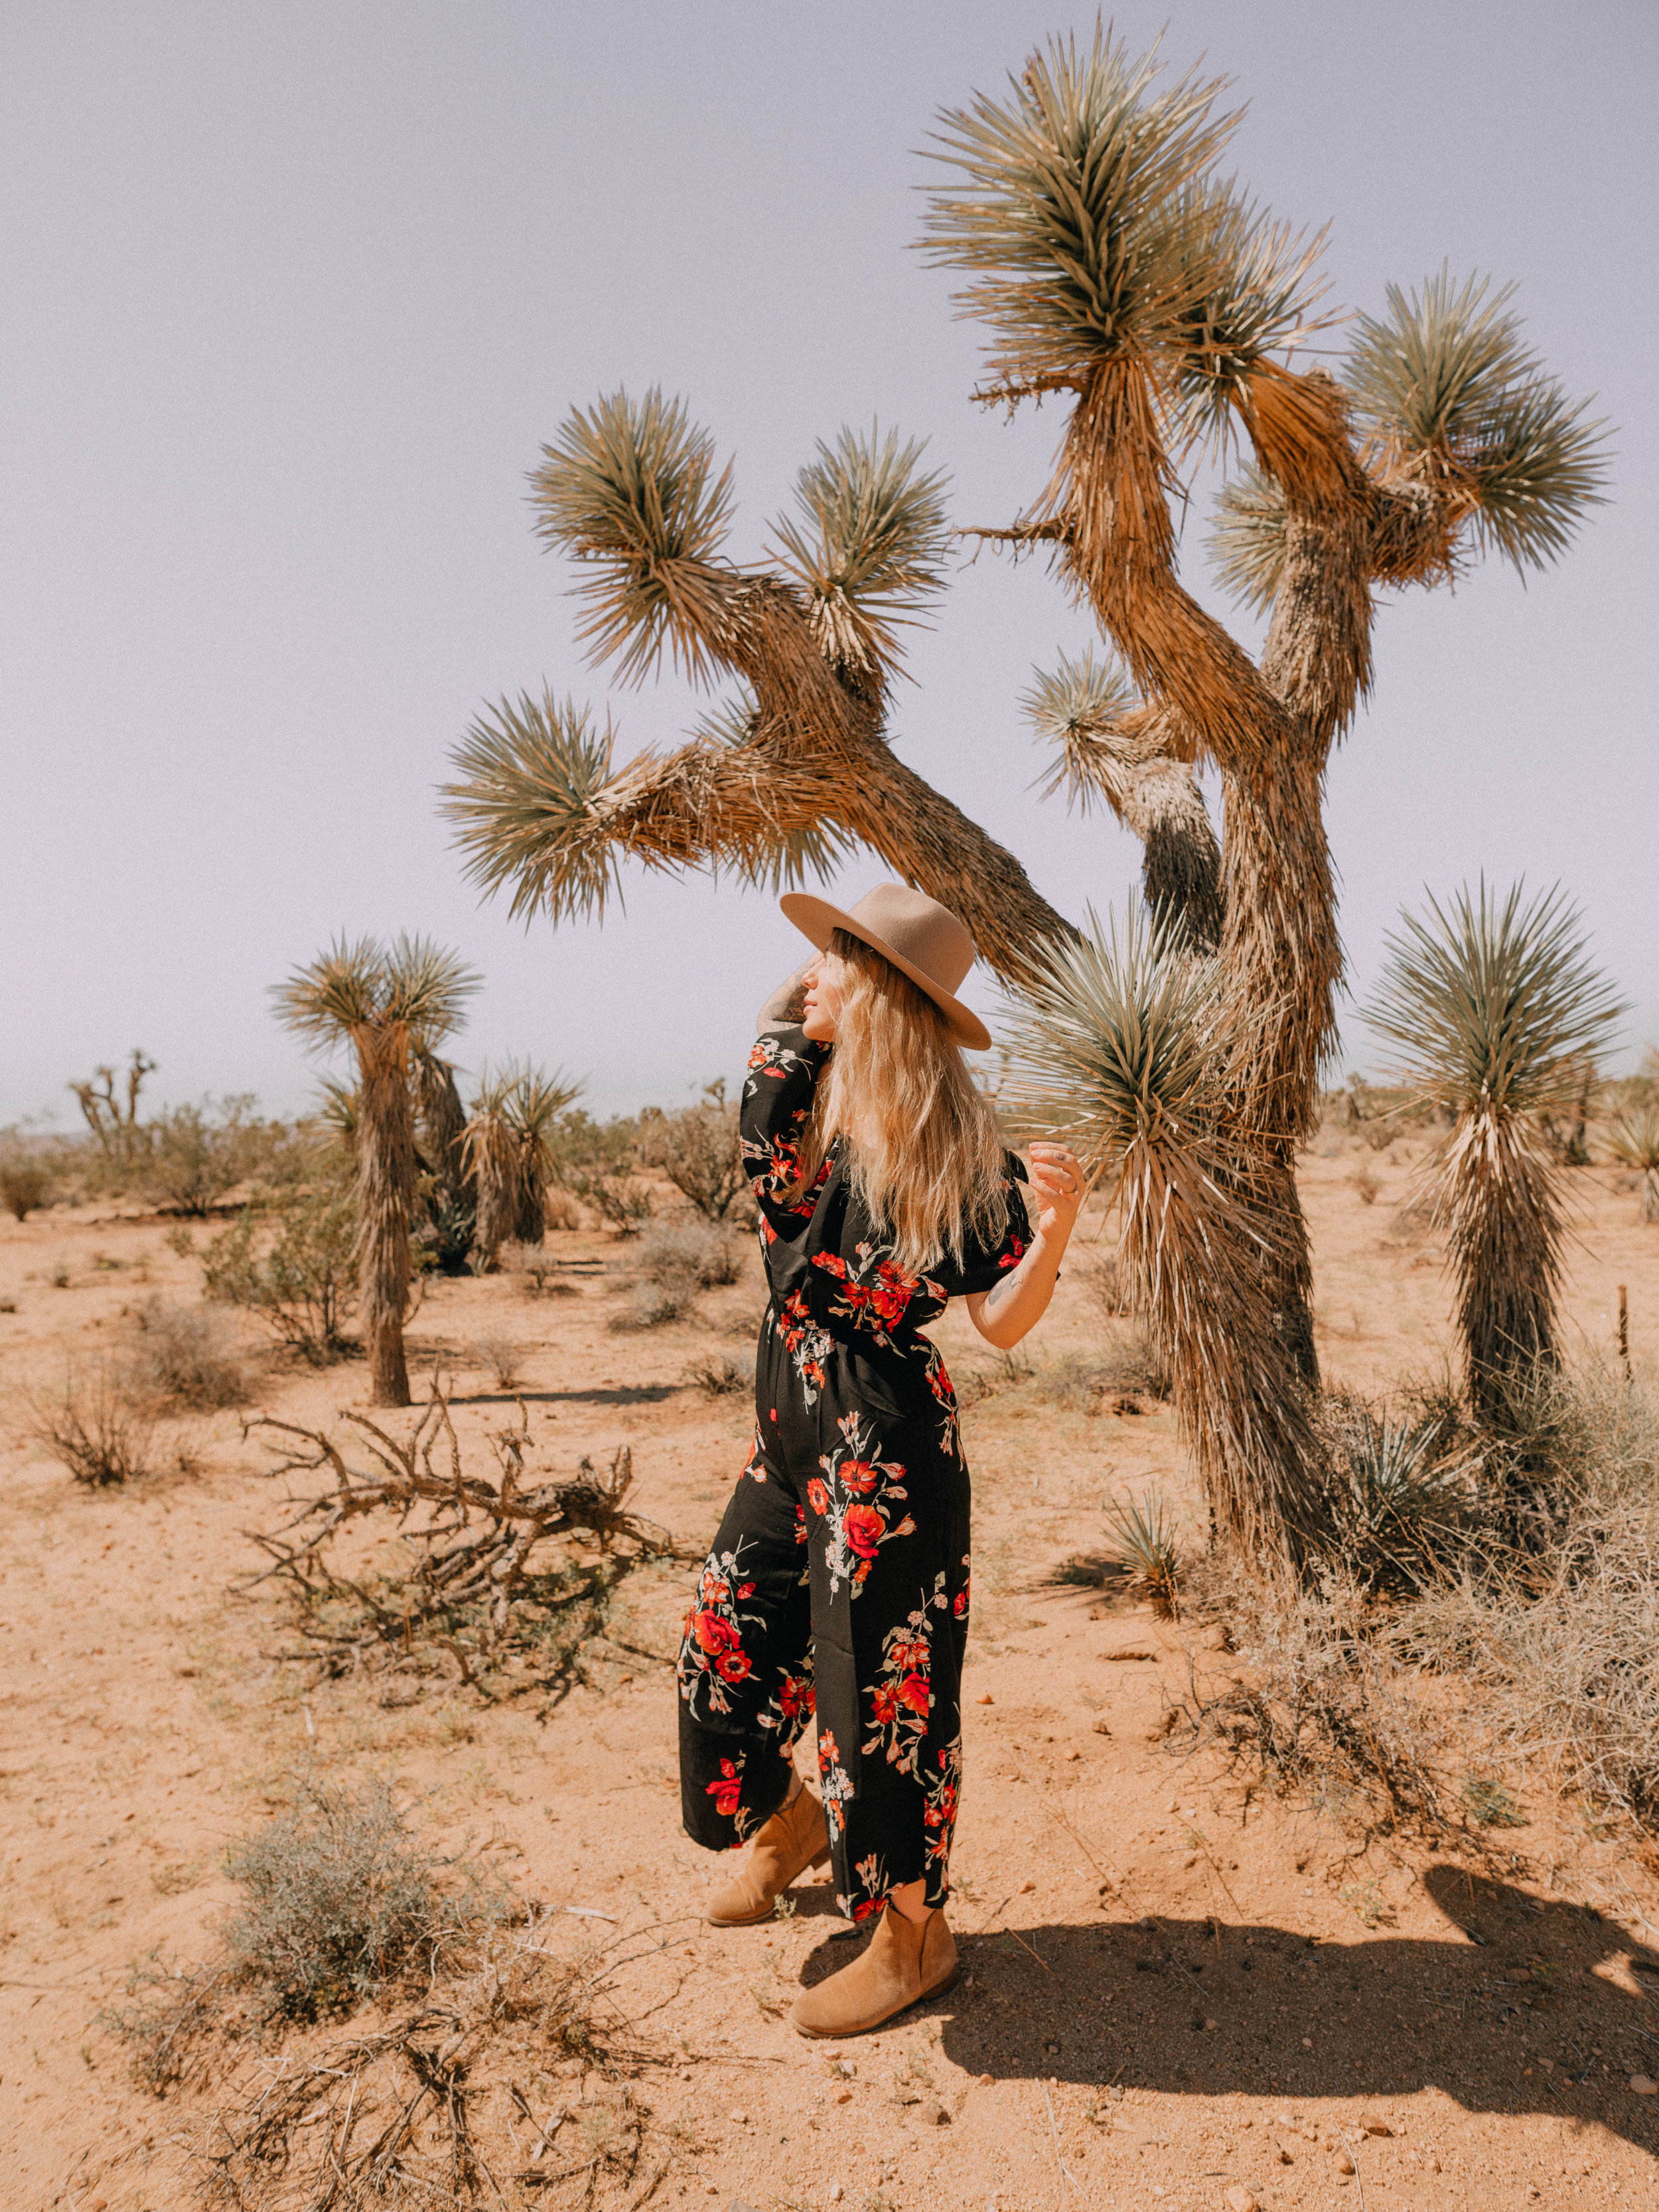 desert-dwelling-joshua-tree-15.jpg